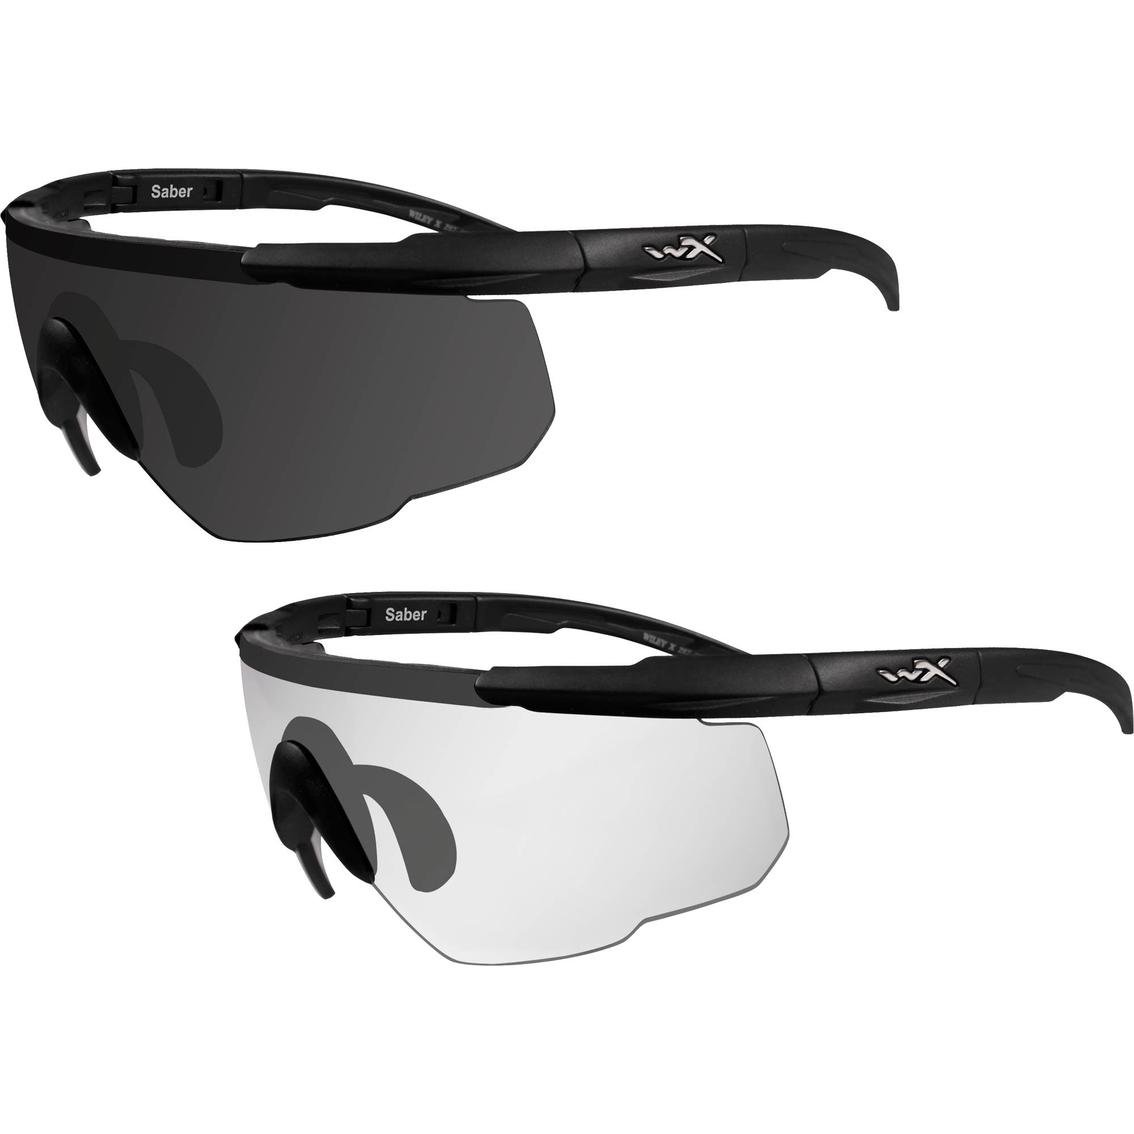 acf48302d76 Wiley X Unisex Saber Advanced X2 Sunglasses Set